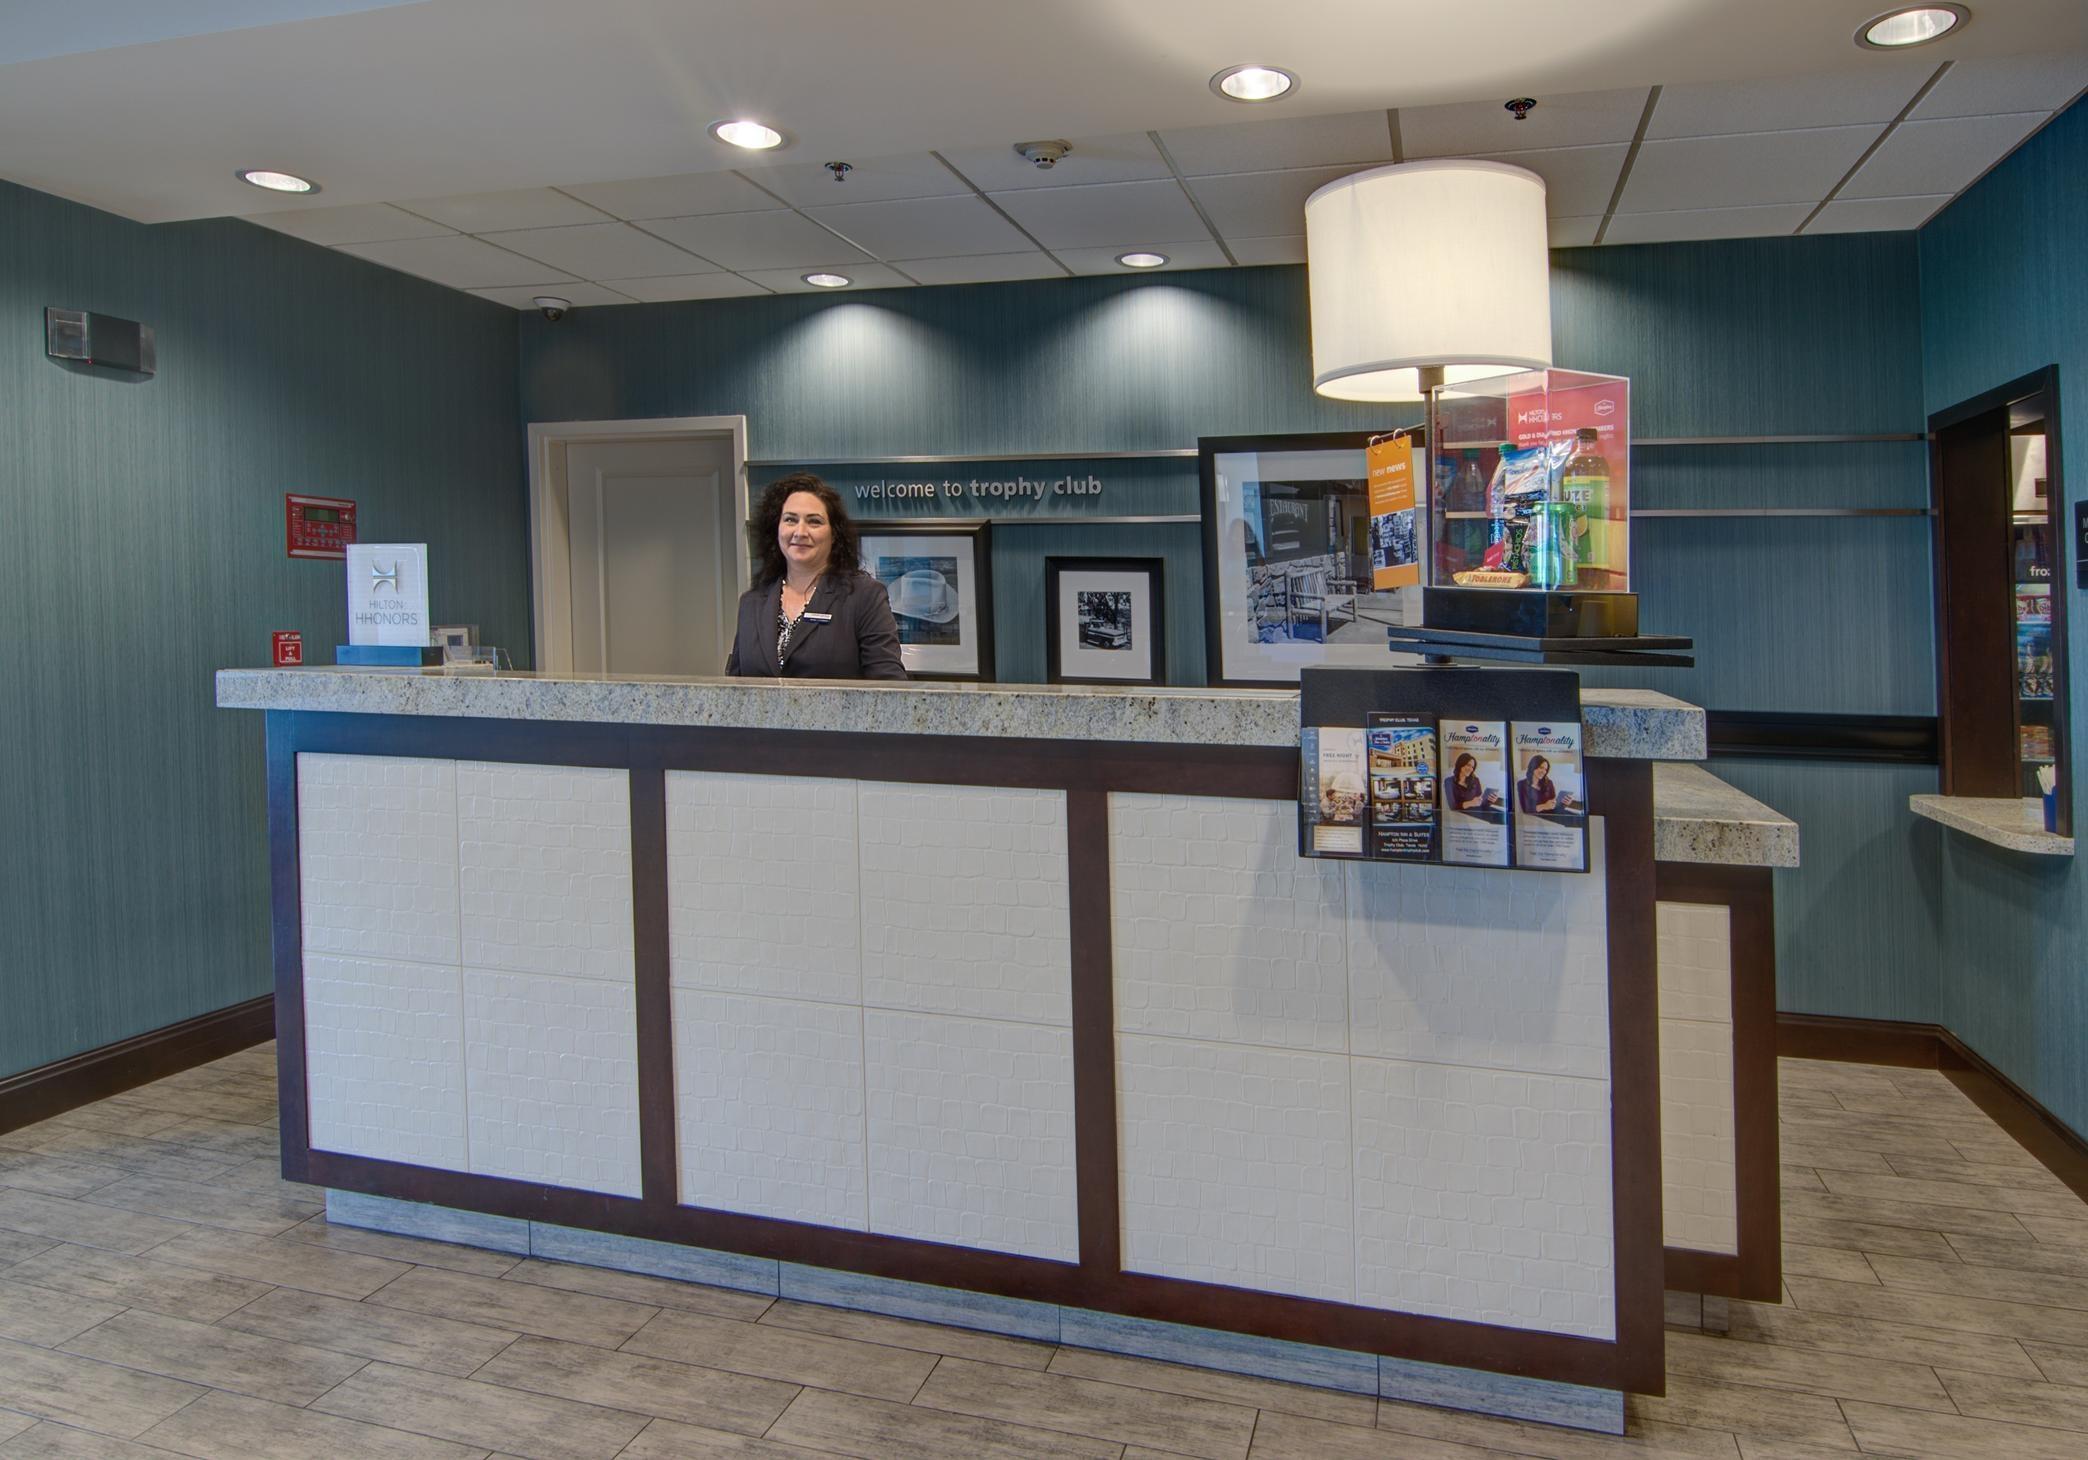 Hampton Inn & Suites Trophy Club - Fort Worth North image 3